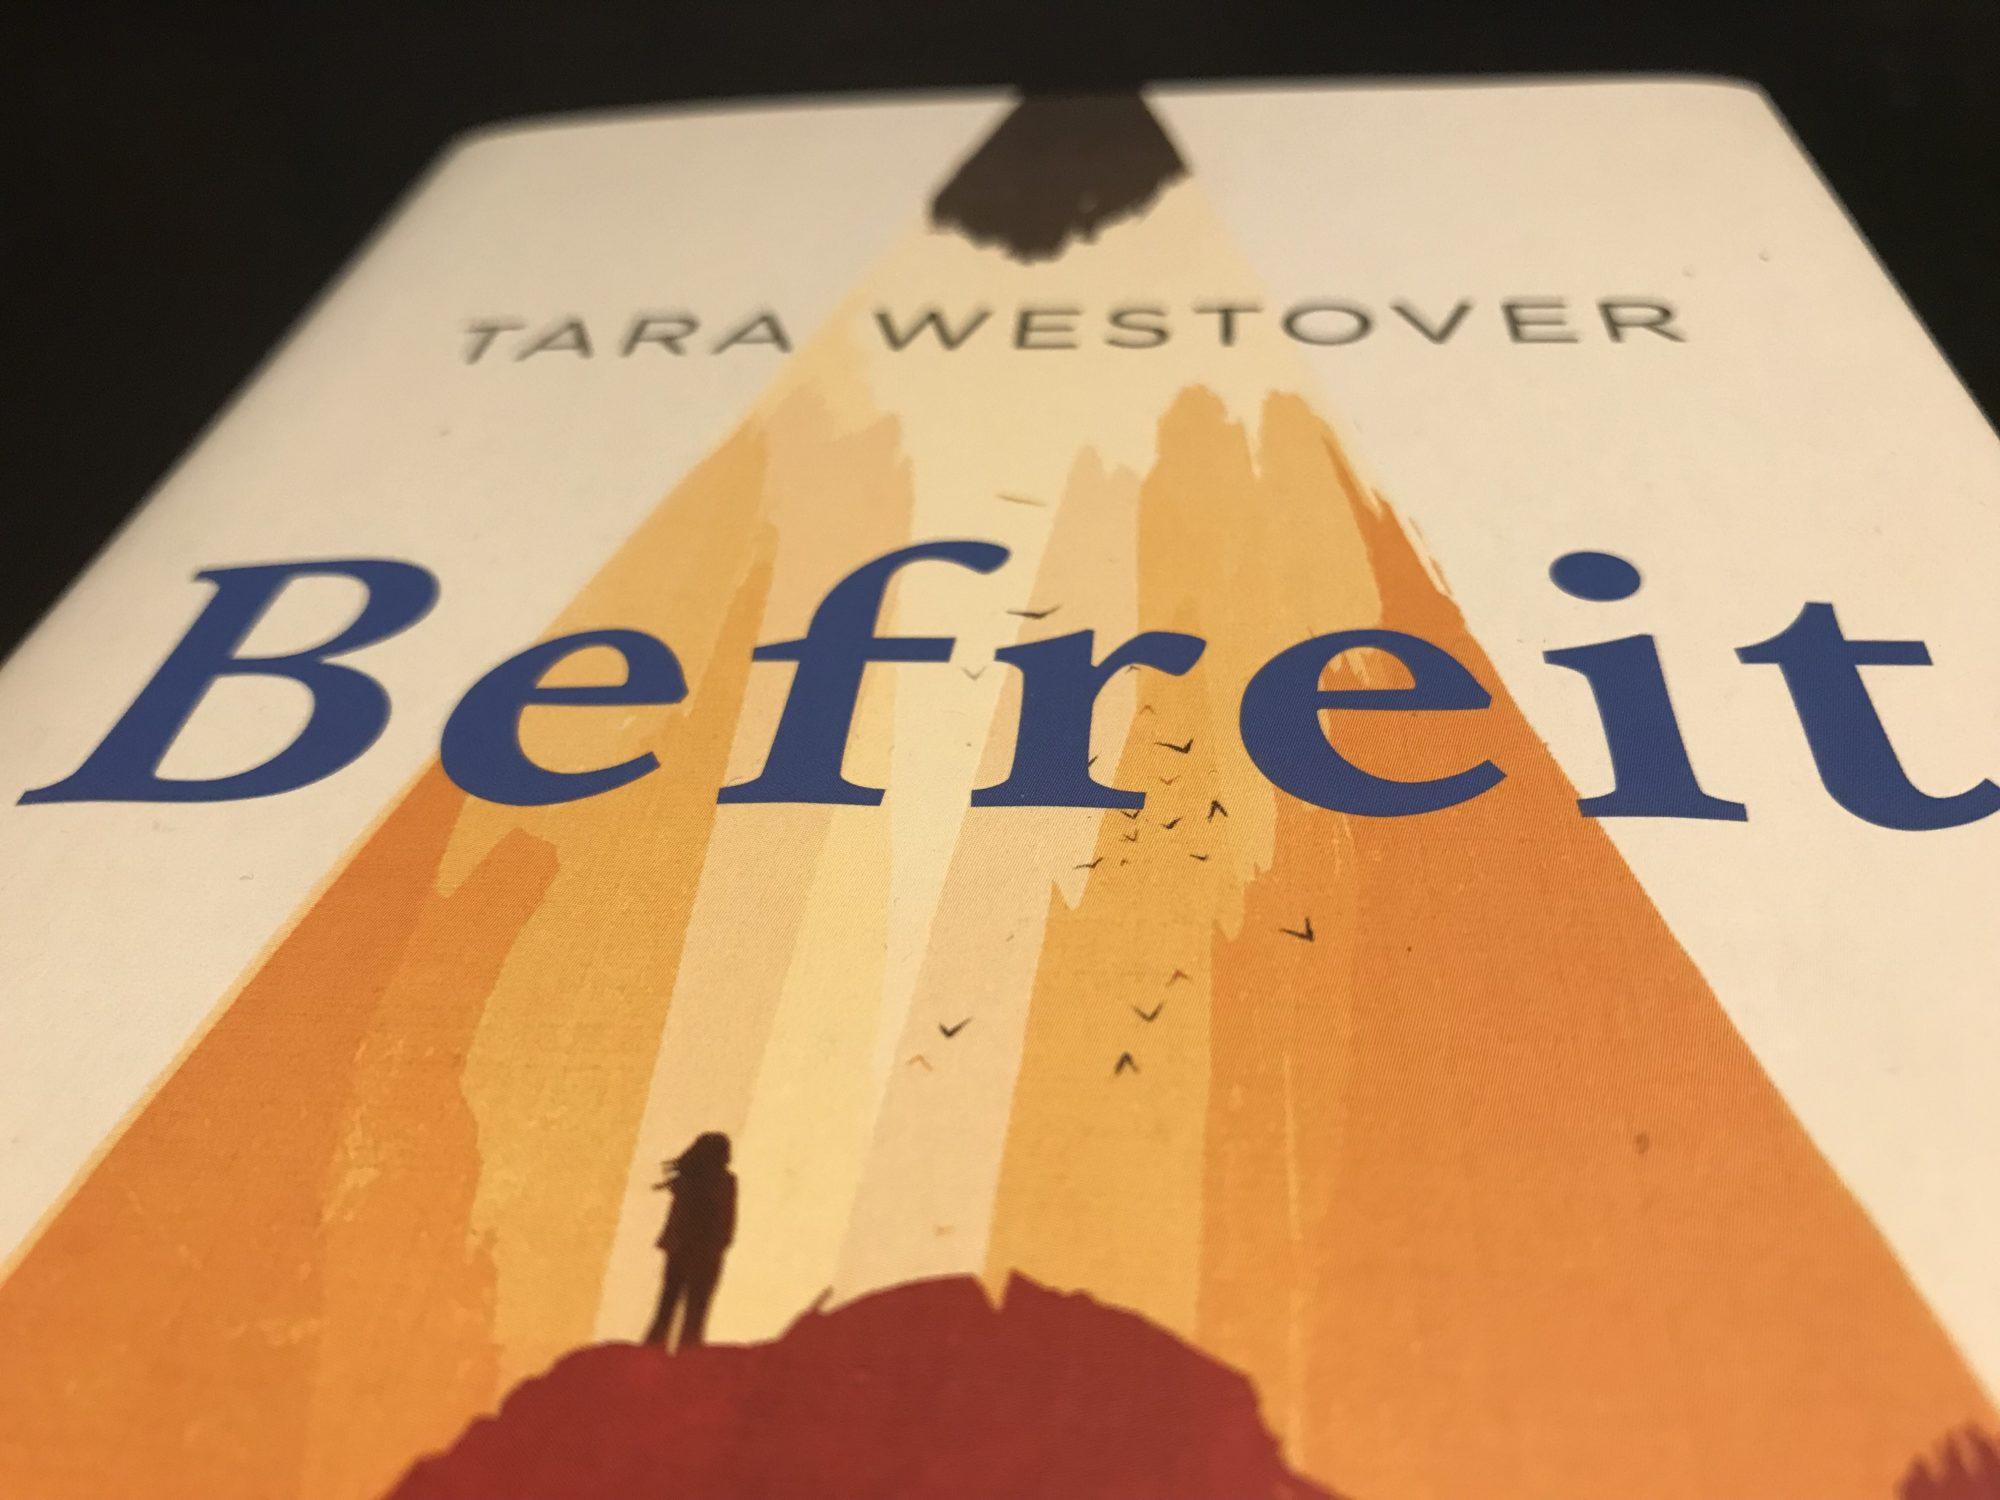 Befreit Tara Westover